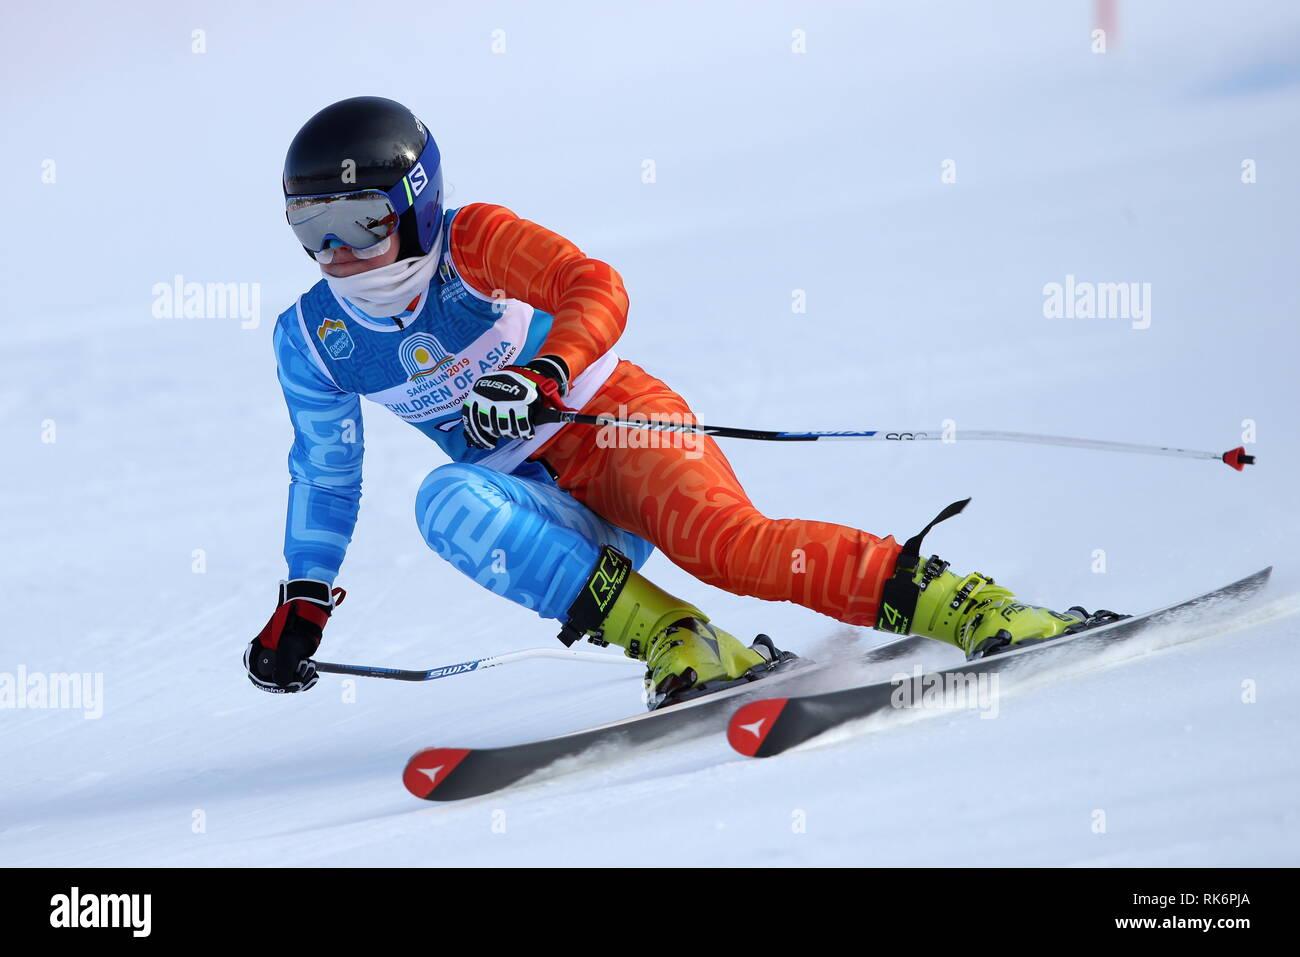 Yuzhno Sakhalinsk, Russia. 10th Feb, 2019. YUZHNO-SAKHALINSK, RUSSIA - FEBRUARY 10, 2019: Russia's Karina Gaidamashchuk competes in the alpine skiing women's super giant slalom event at the 1st Children of Asia Winter International Sports Games. Andrei Golovanov/TASS Credit: ITAR-TASS News Agency/Alamy Live News - Stock Image